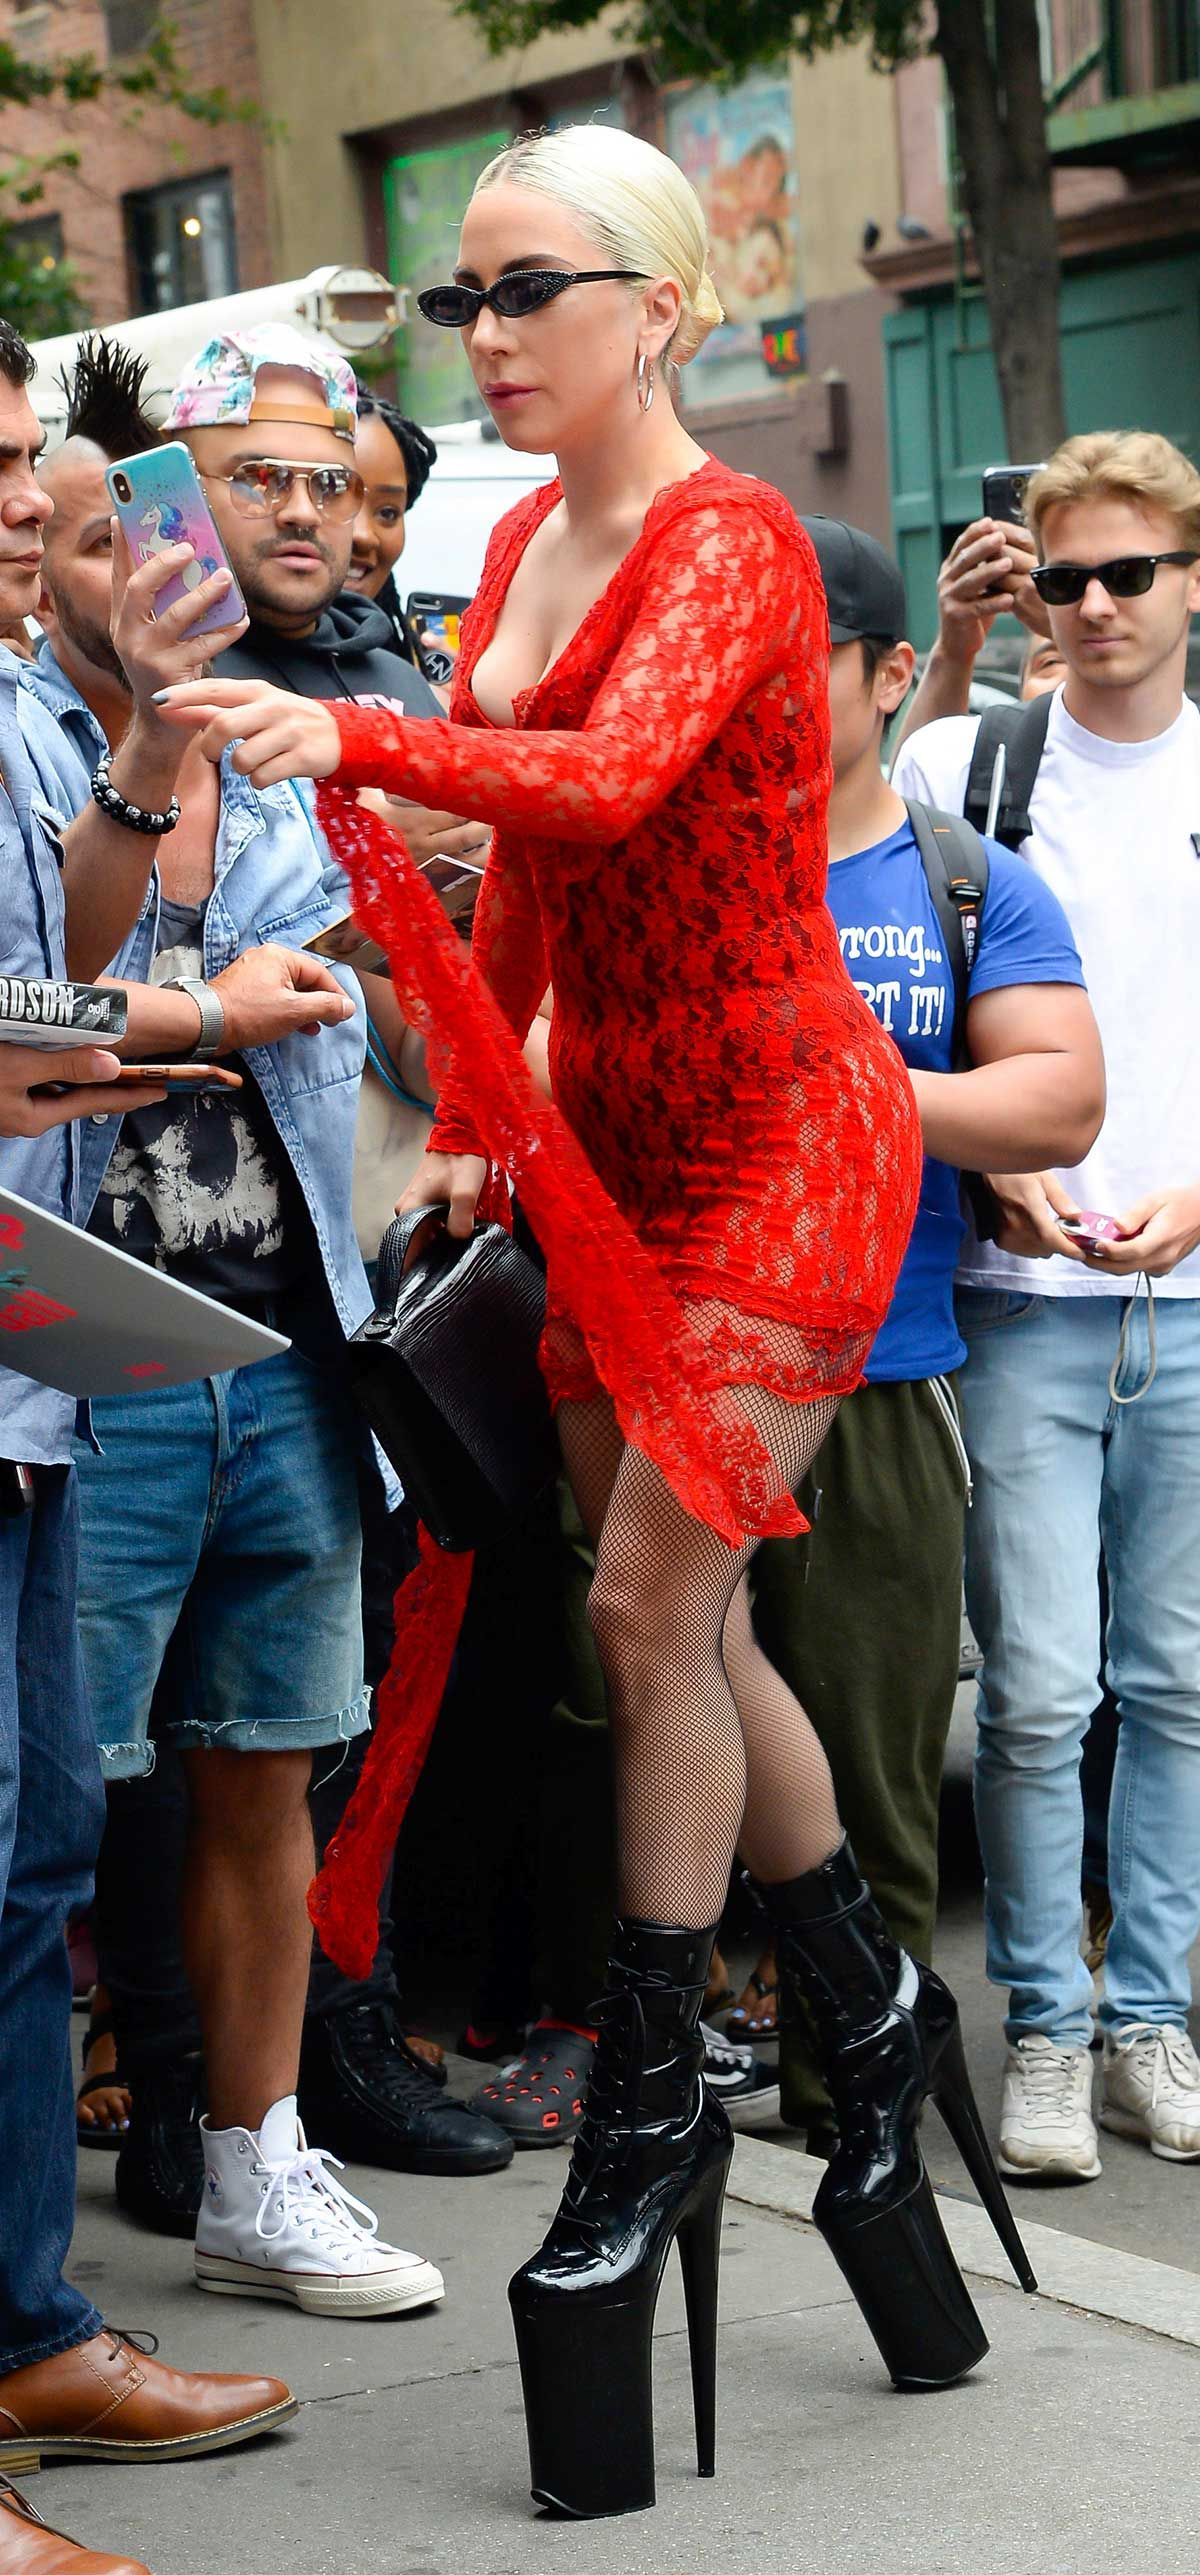 Lady Gaga Ben Affleck Ashley Graham Mellis protagonizan el 'Vaya toalla' de la semana